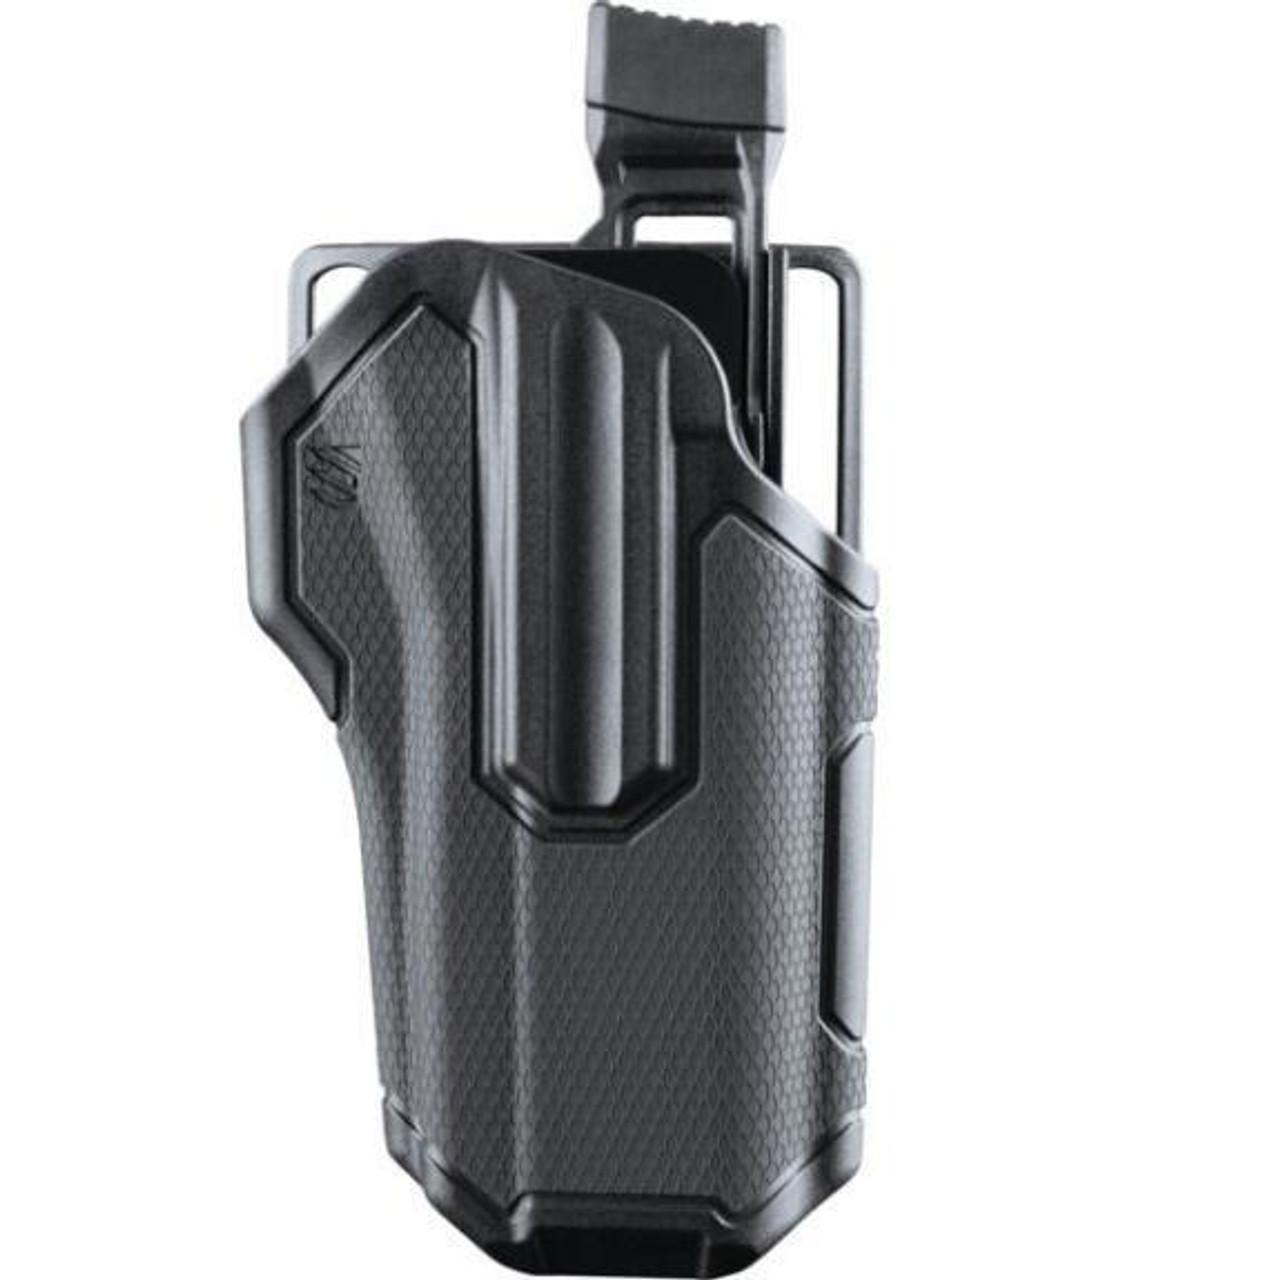 BLACKHAWK - Omnivore Multi fit Holster for Most Handguns with Rails Grey/Black